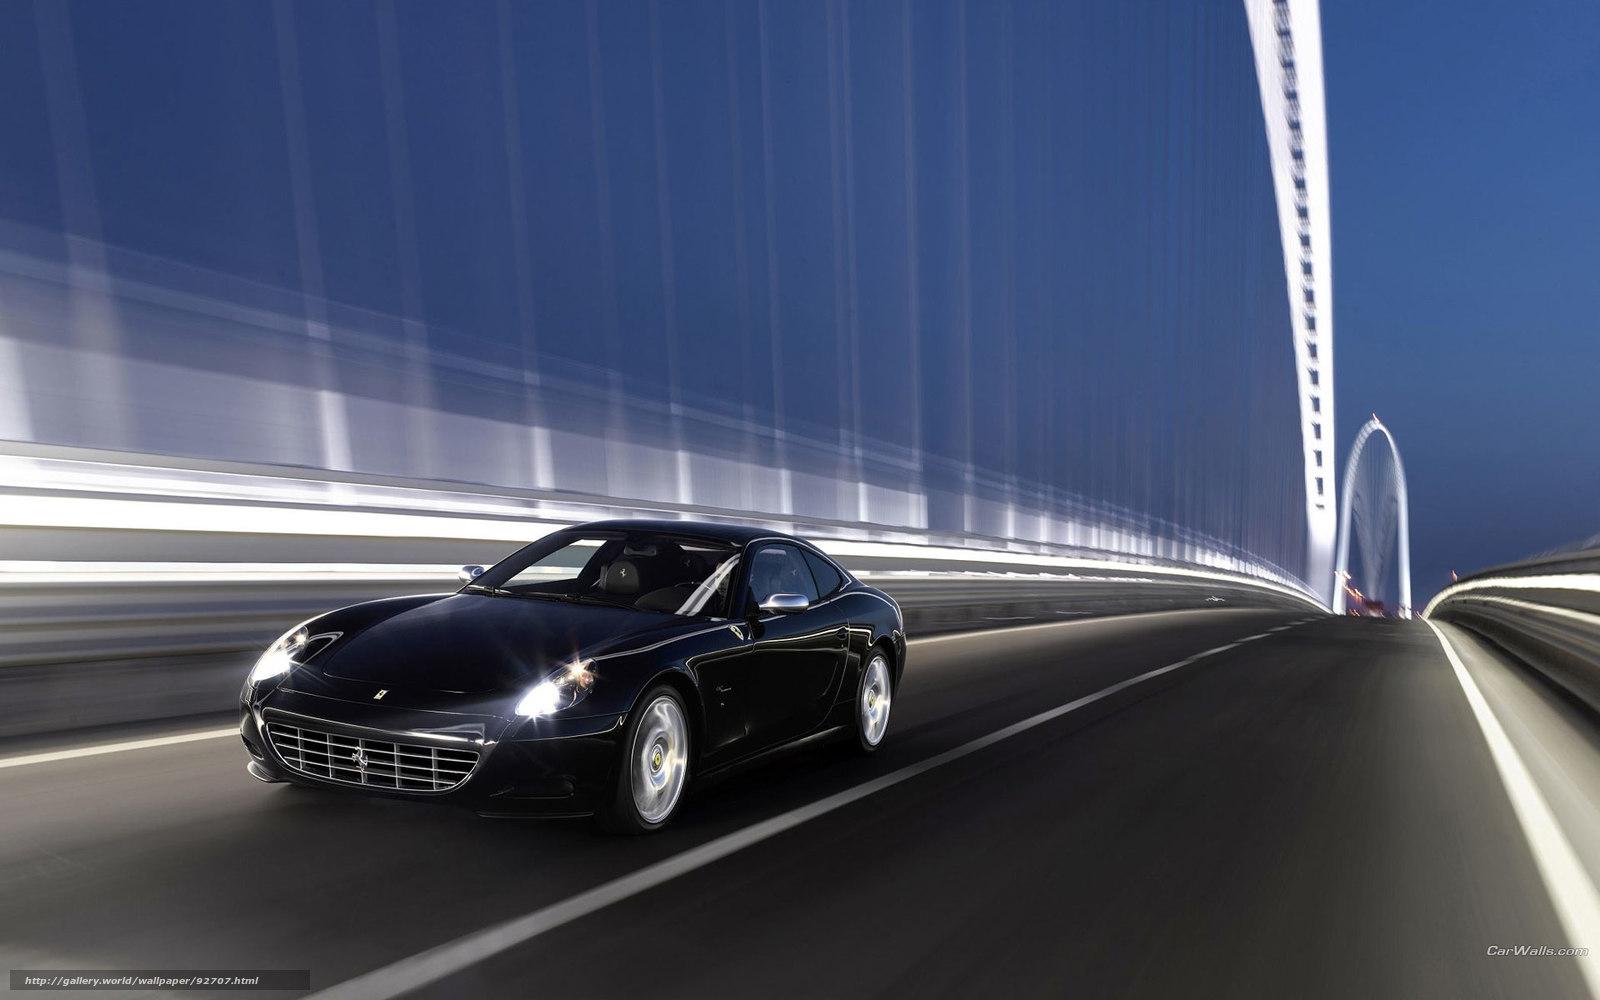 Download wallpaper Ferrari,  90210,  auto,  Machines free desktop wallpaper in the resolution 1920x1200 — picture №92707